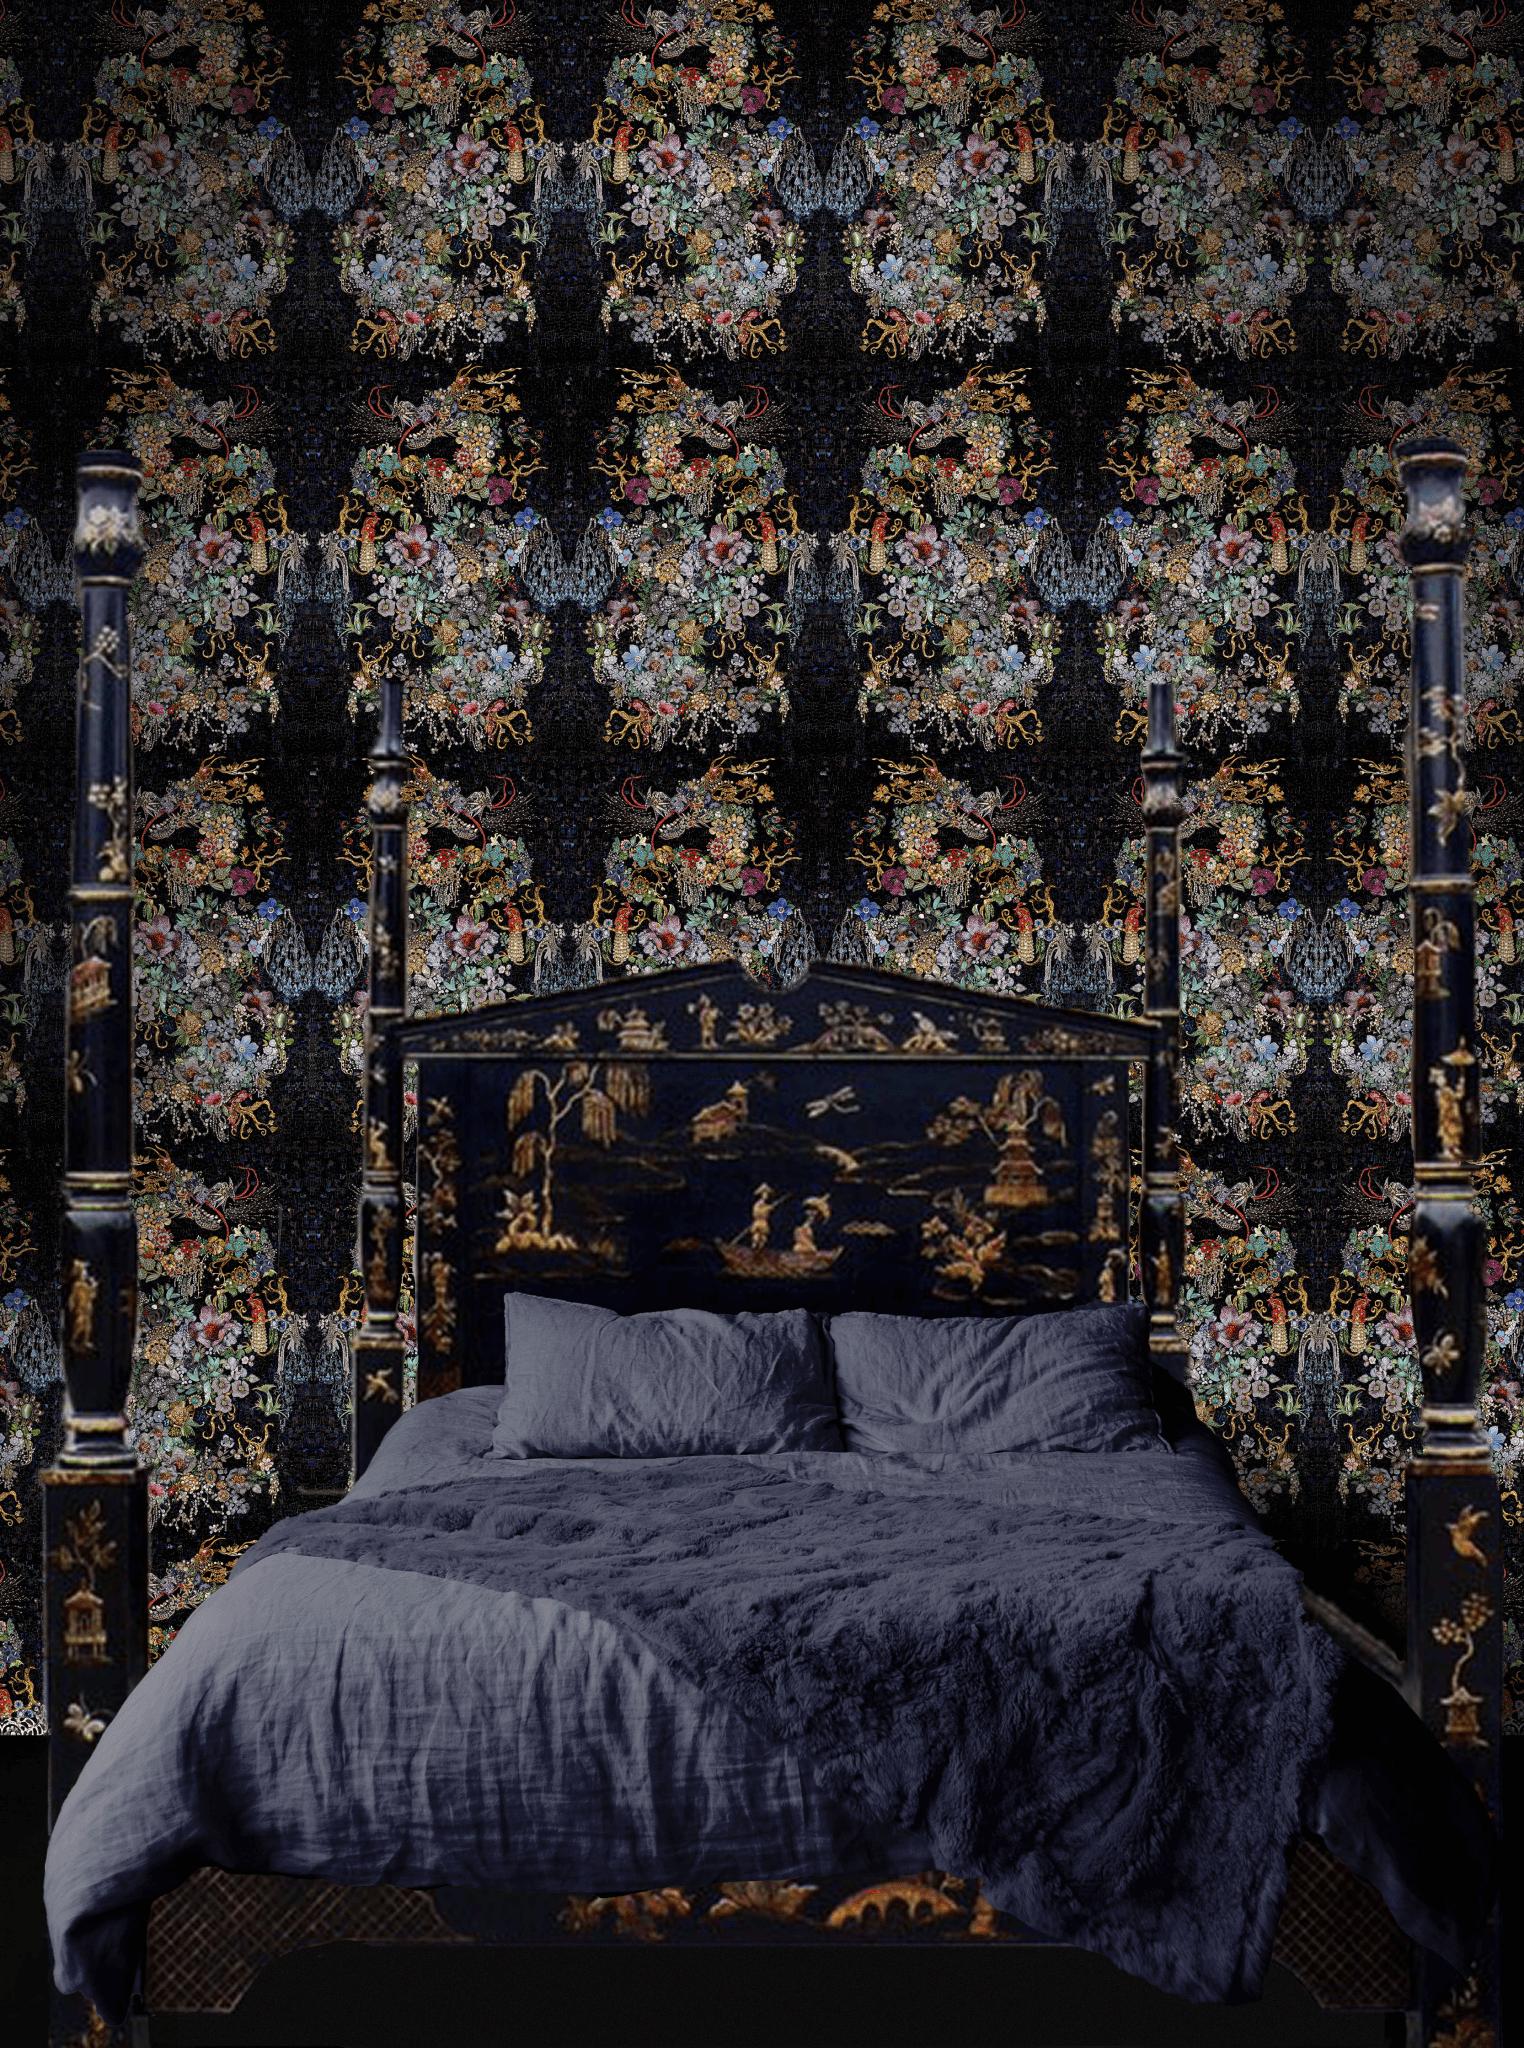 The Gate Keeper wallpaper